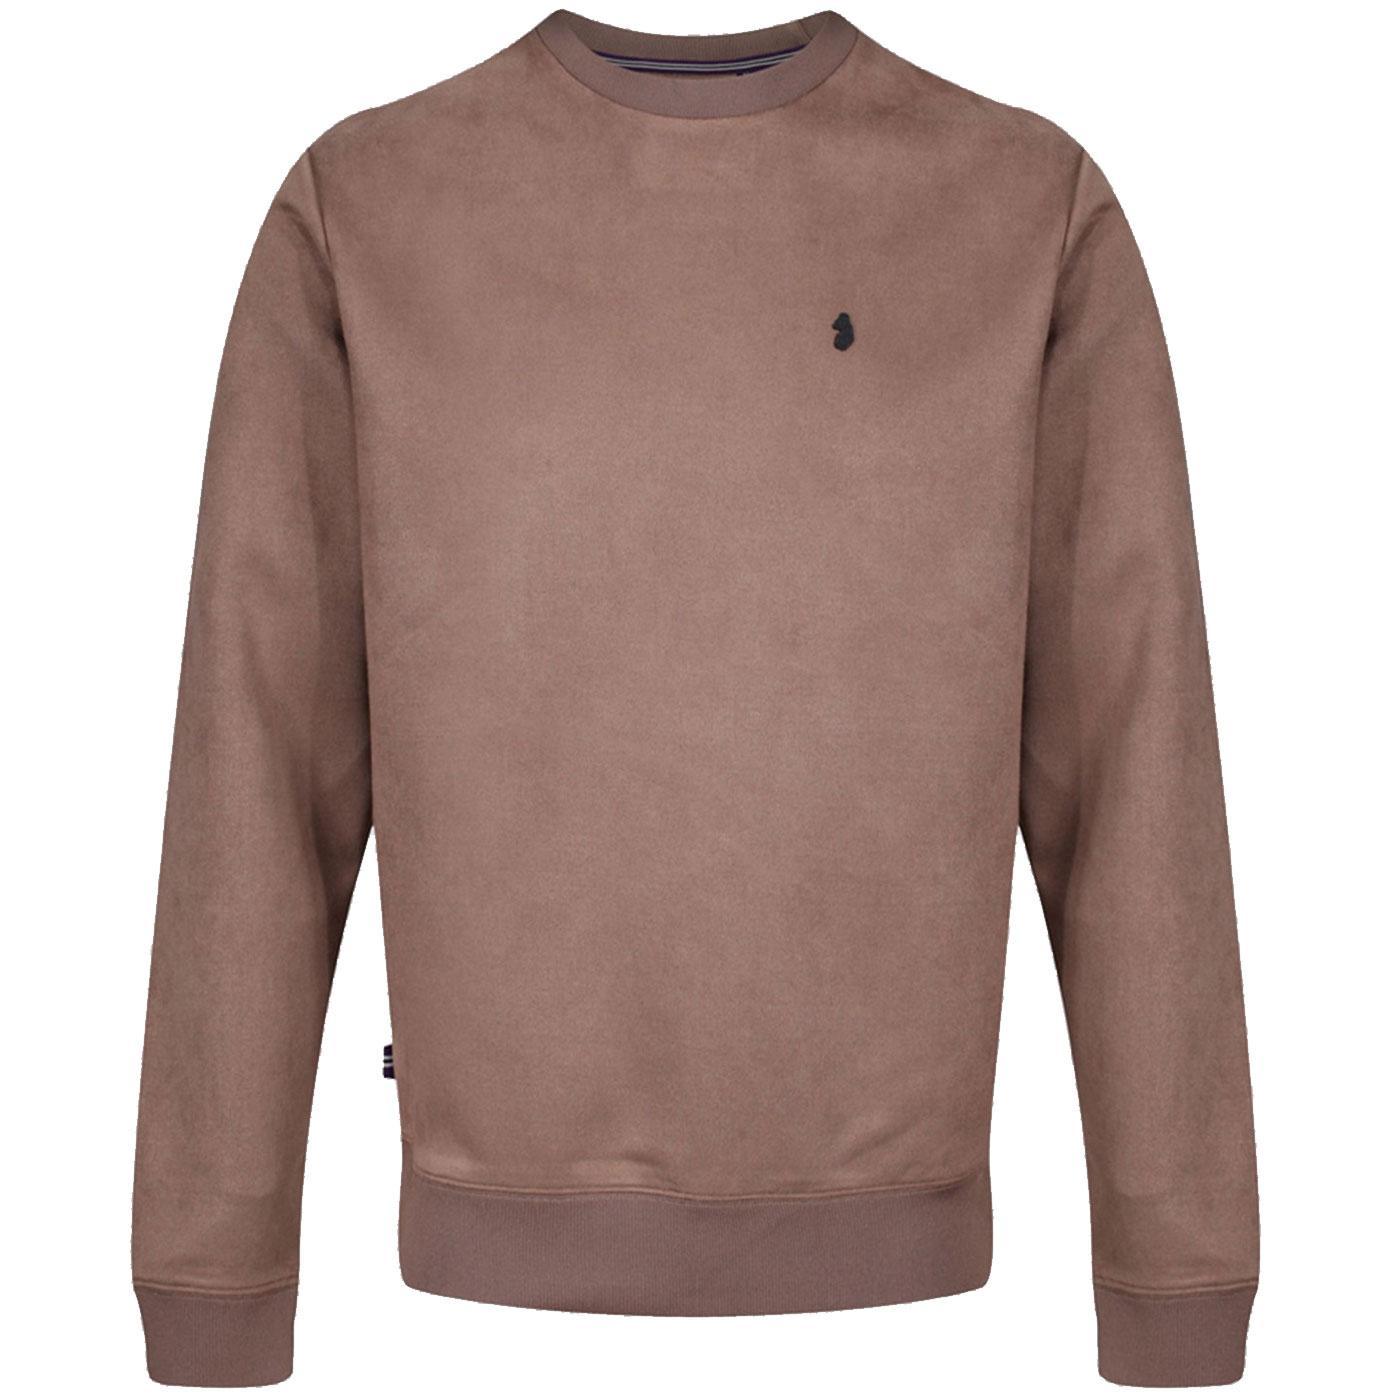 Dennis LUKE Mens Retro Faux Suede Sweatshirt